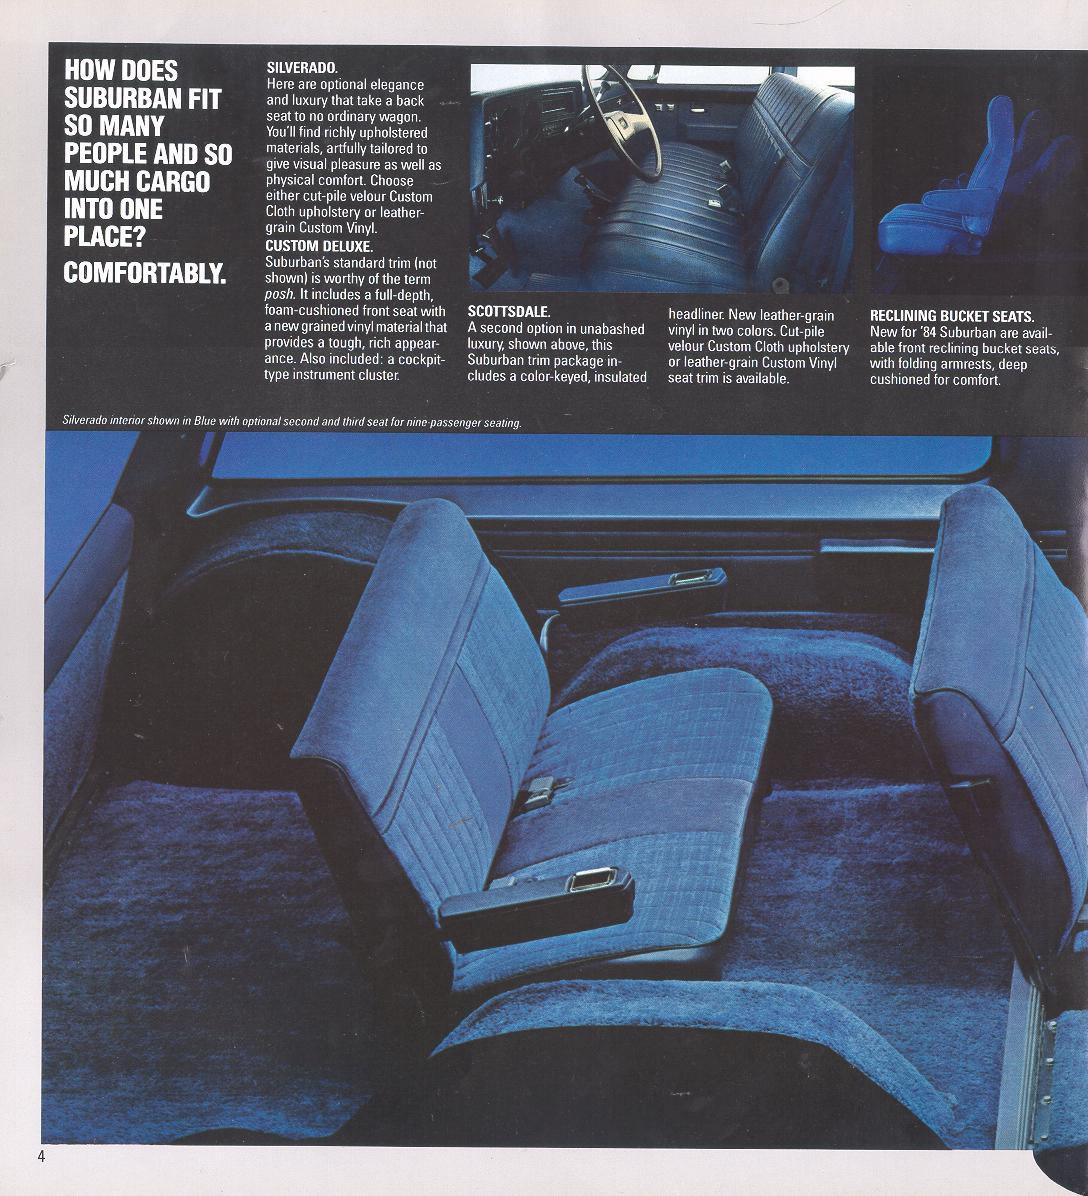 1984 Gmc File Chevrolet K5 Blazer Jpg Wikimedia Commons 1984 Chevrolet And Gmc Truck Brochures